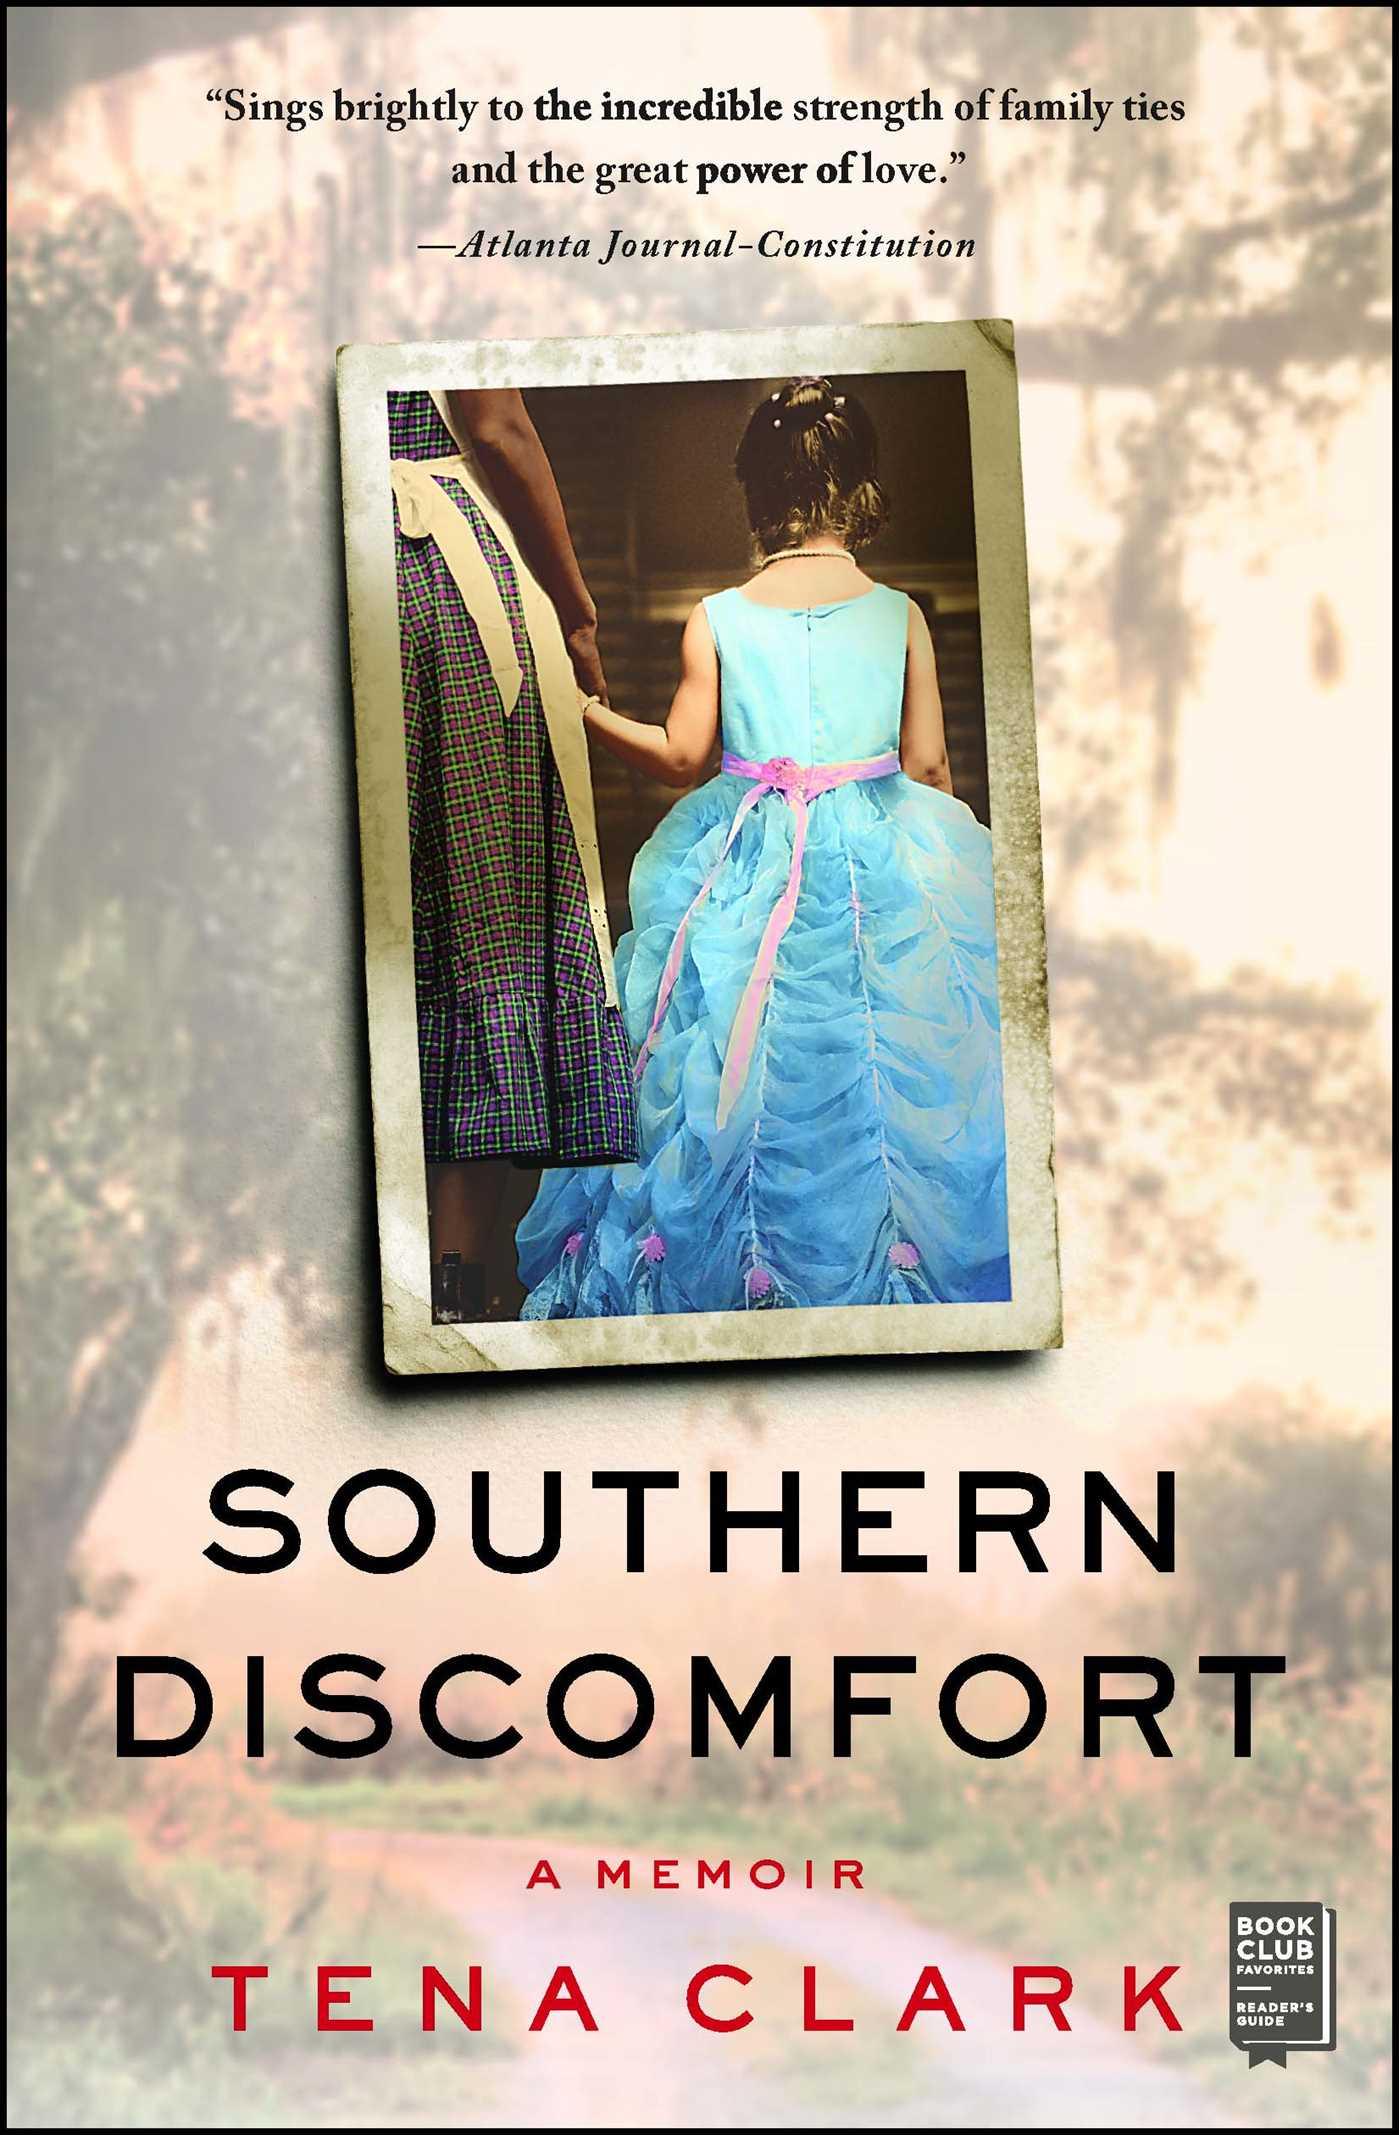 Alabama Arkansas I Sure Miss My Ma And Pa Lyrics southern discomfort  booktena clark  official